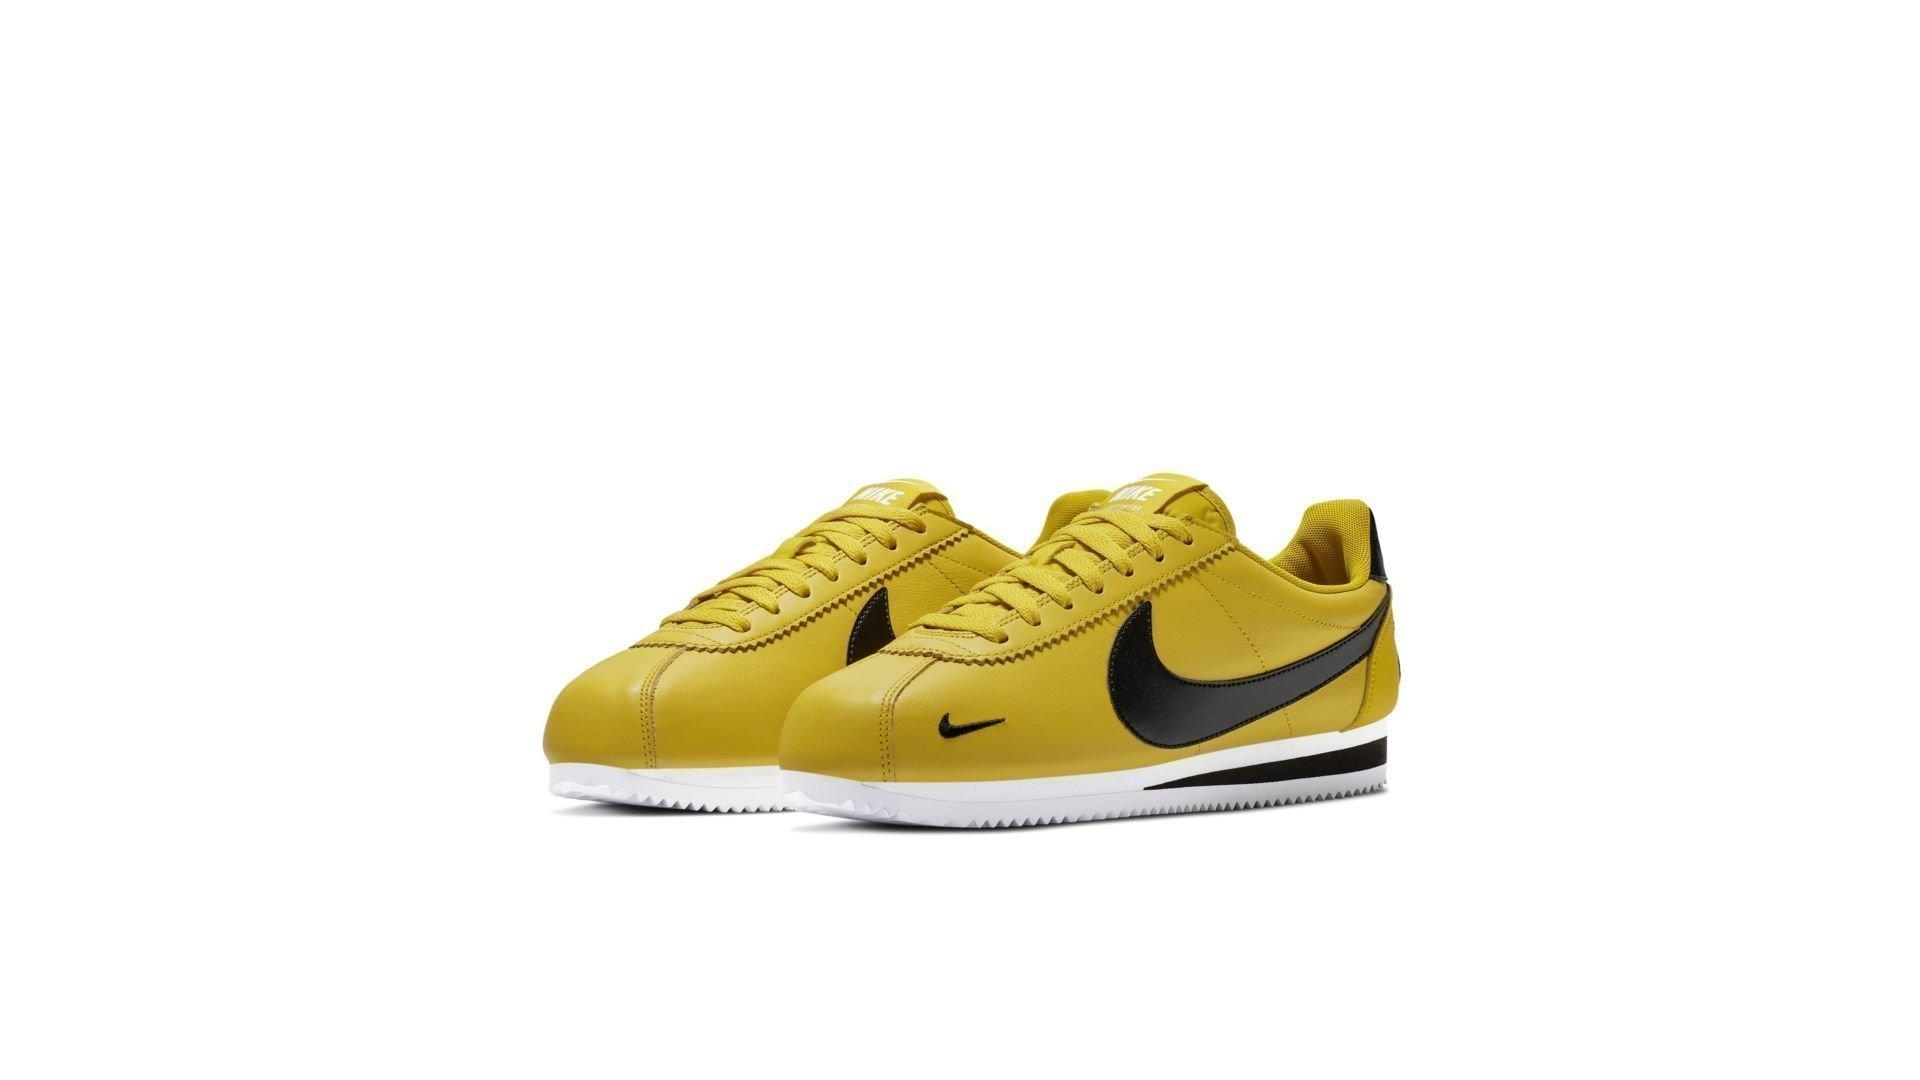 Nike Cortez 807480-700